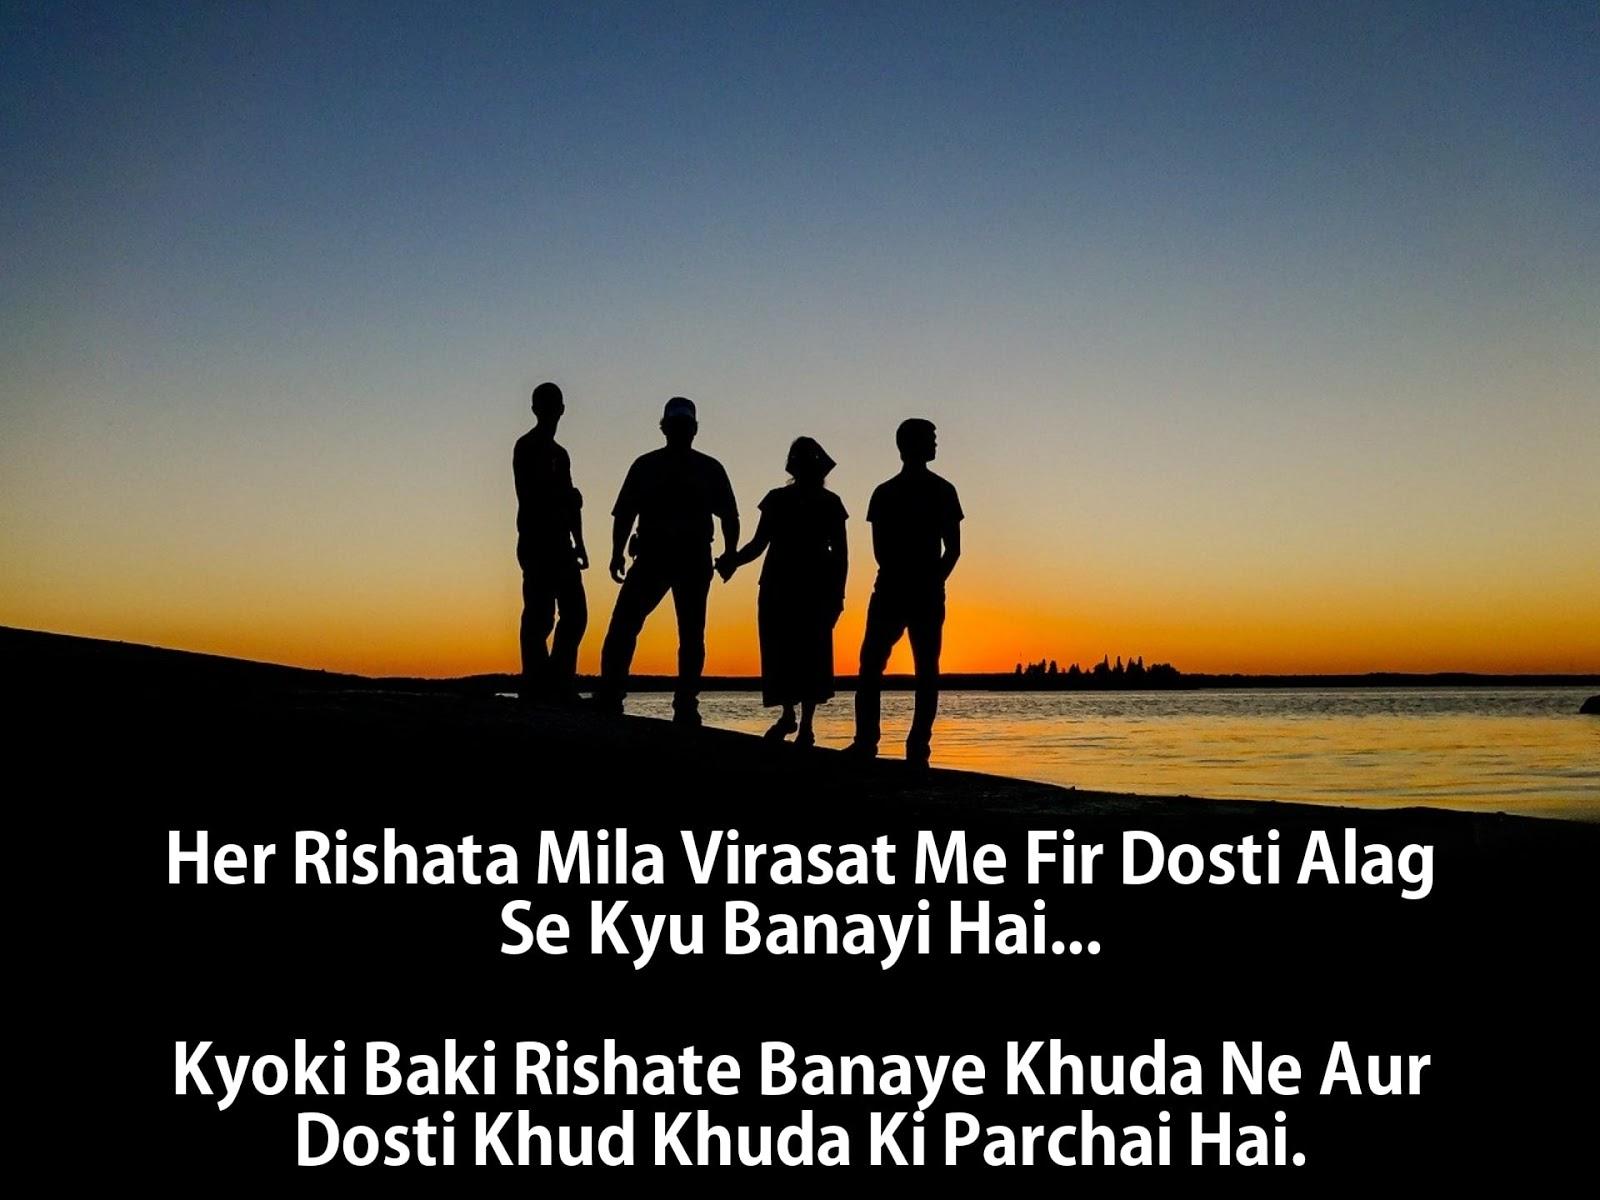 lovely dosti shayari in Hindi